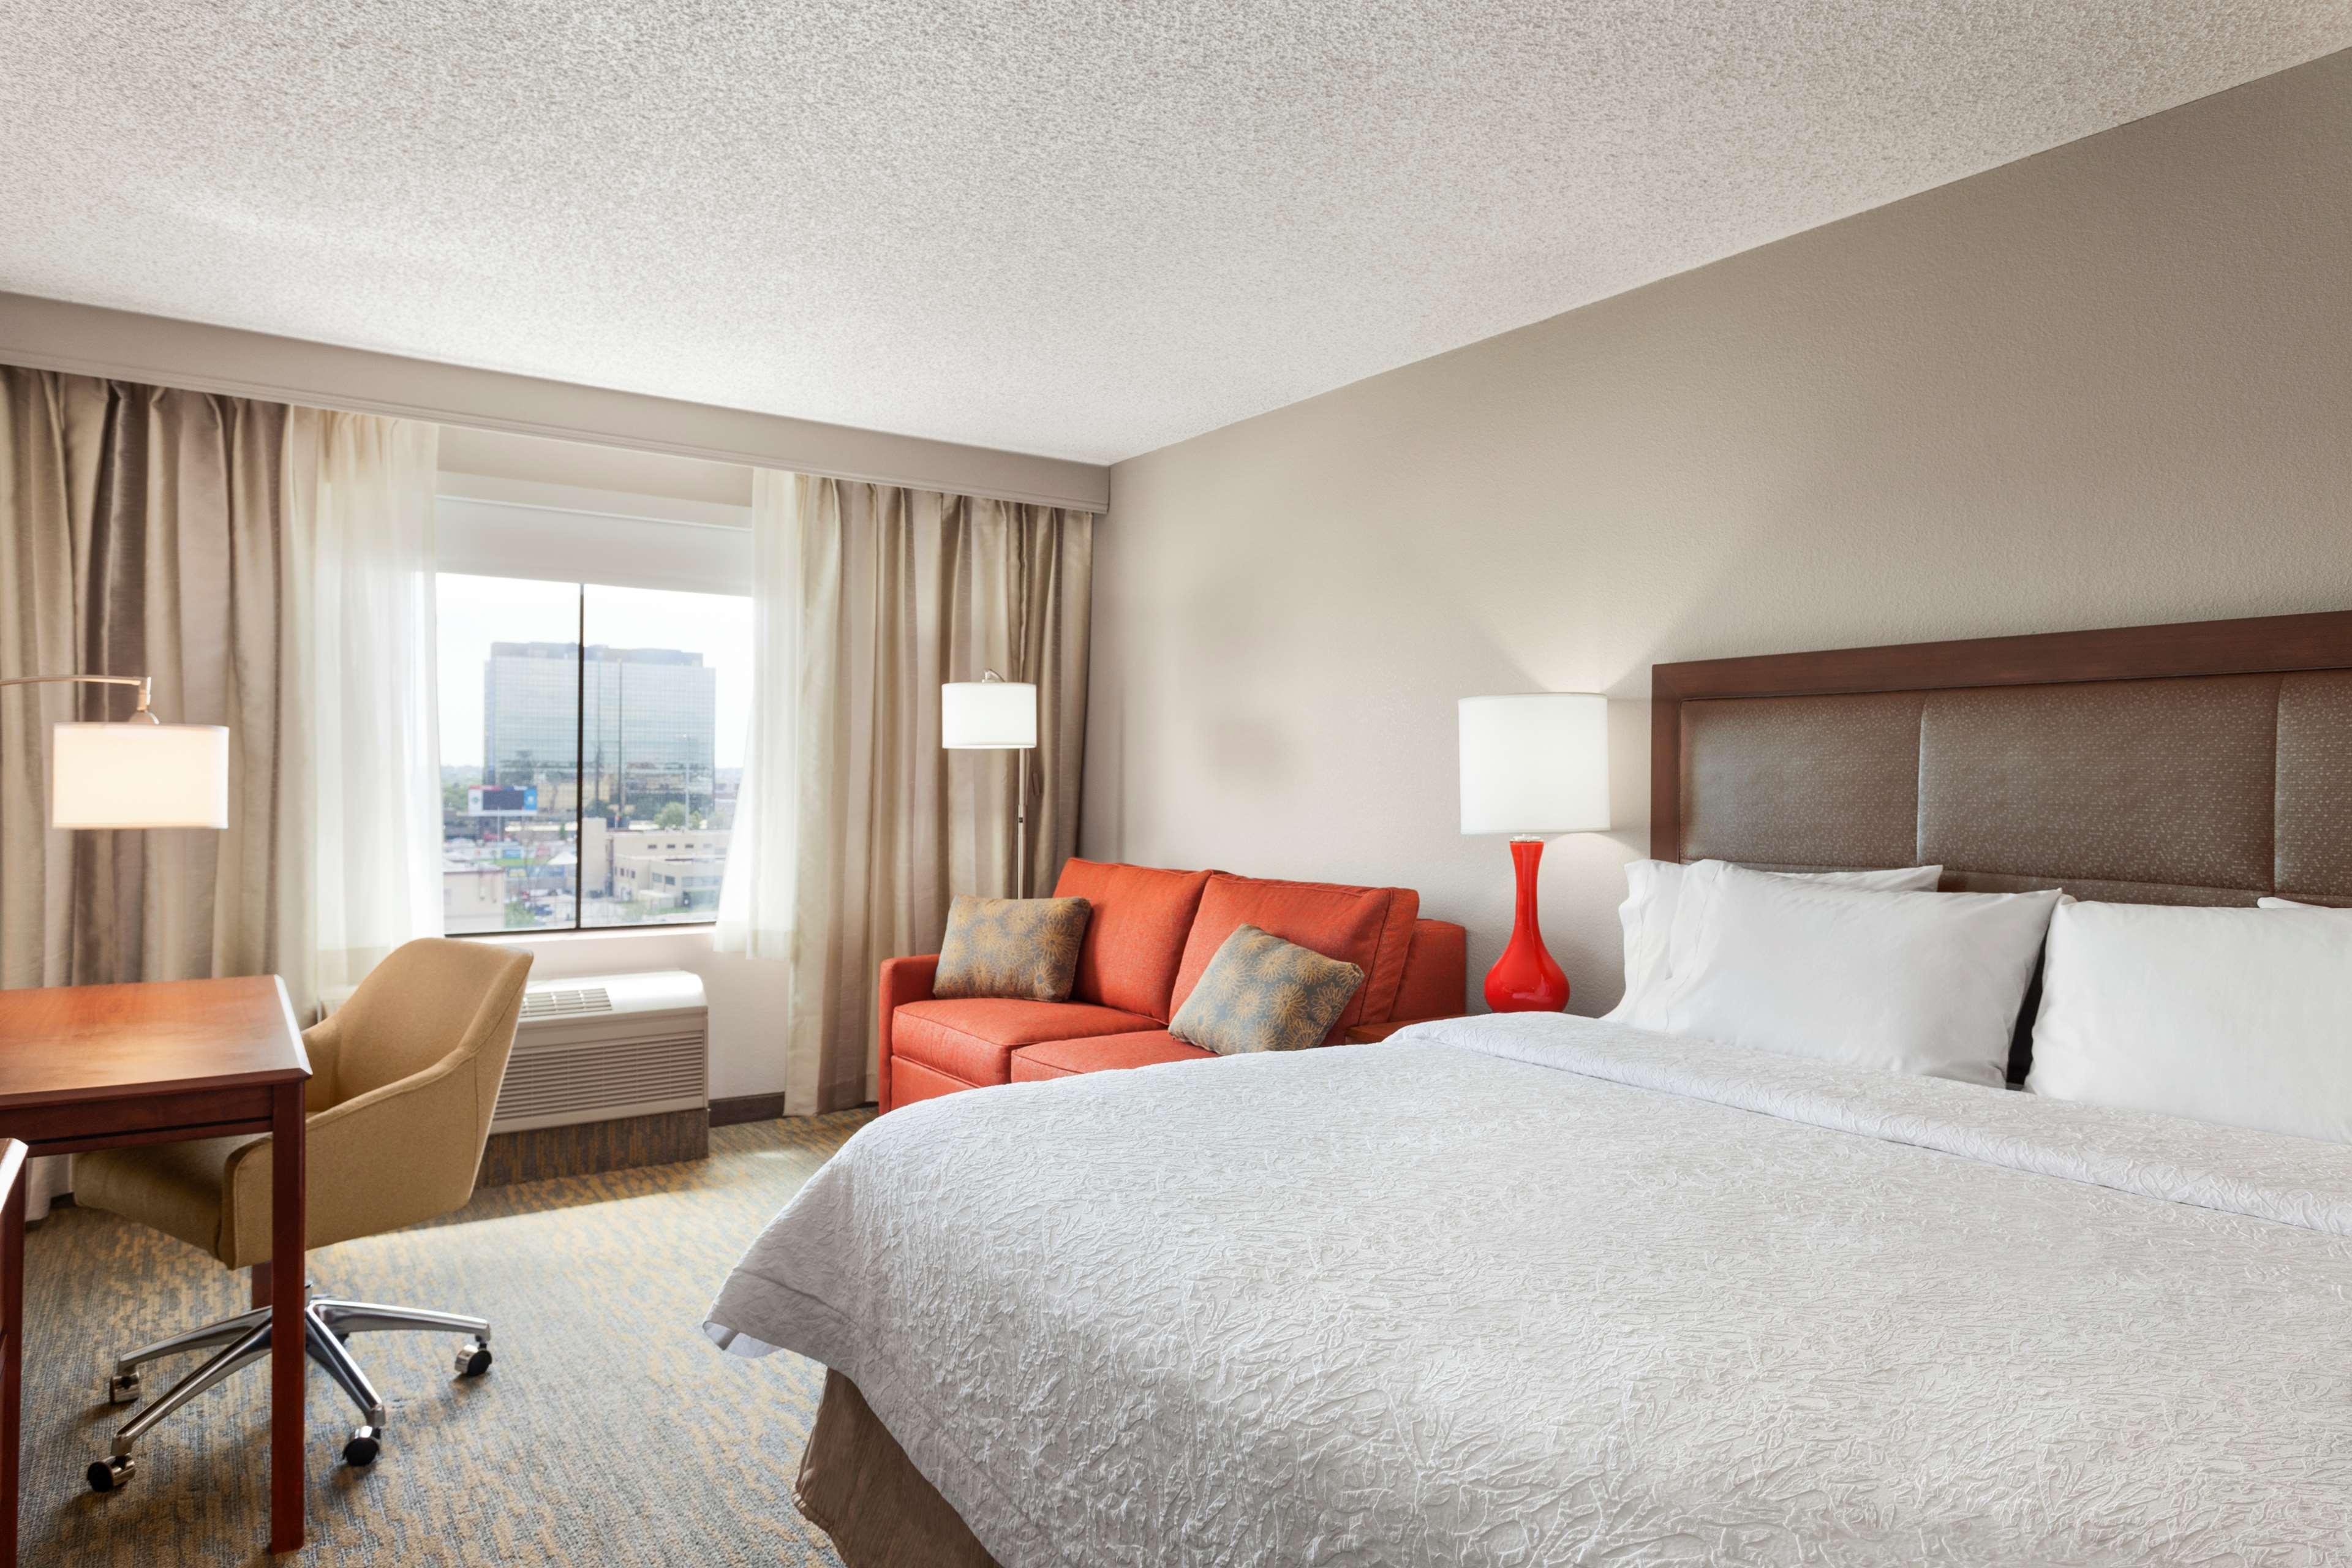 Hampton Inn & Suites Denver-Cherry Creek image 13